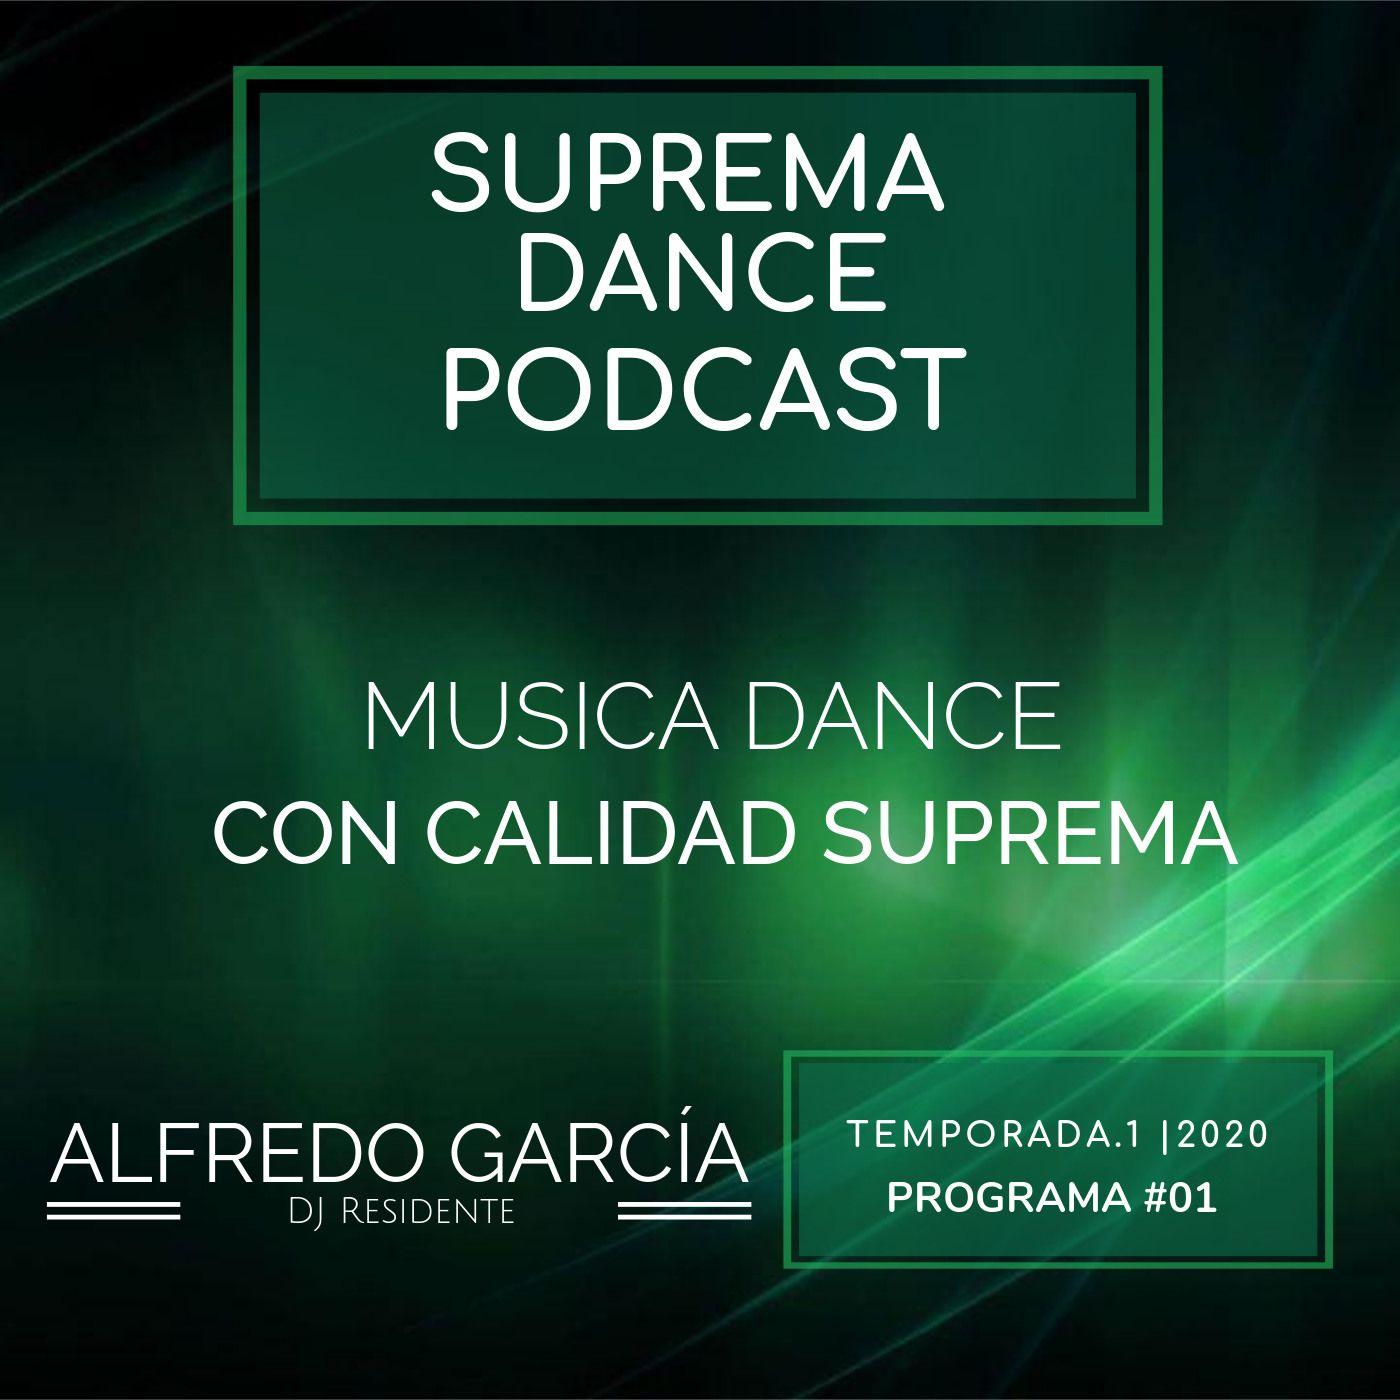 DJ Residente Alfredo García | Programa-1 | T.1 | SDP